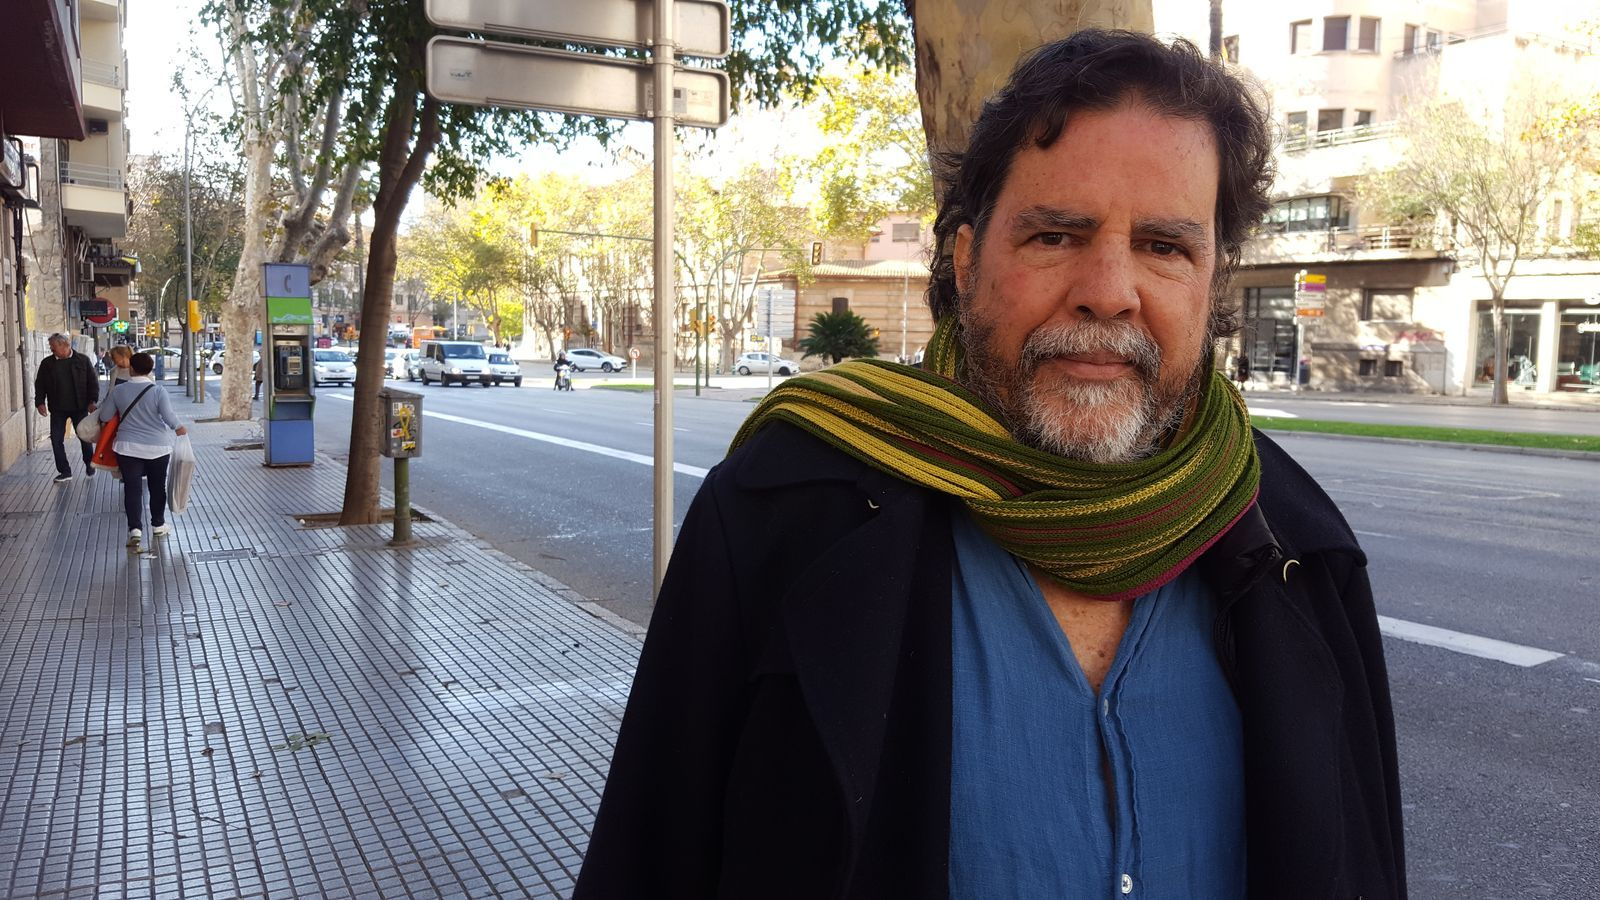 L'activista i sociòleg RamonGrosfoguel a les avingudes de Palma